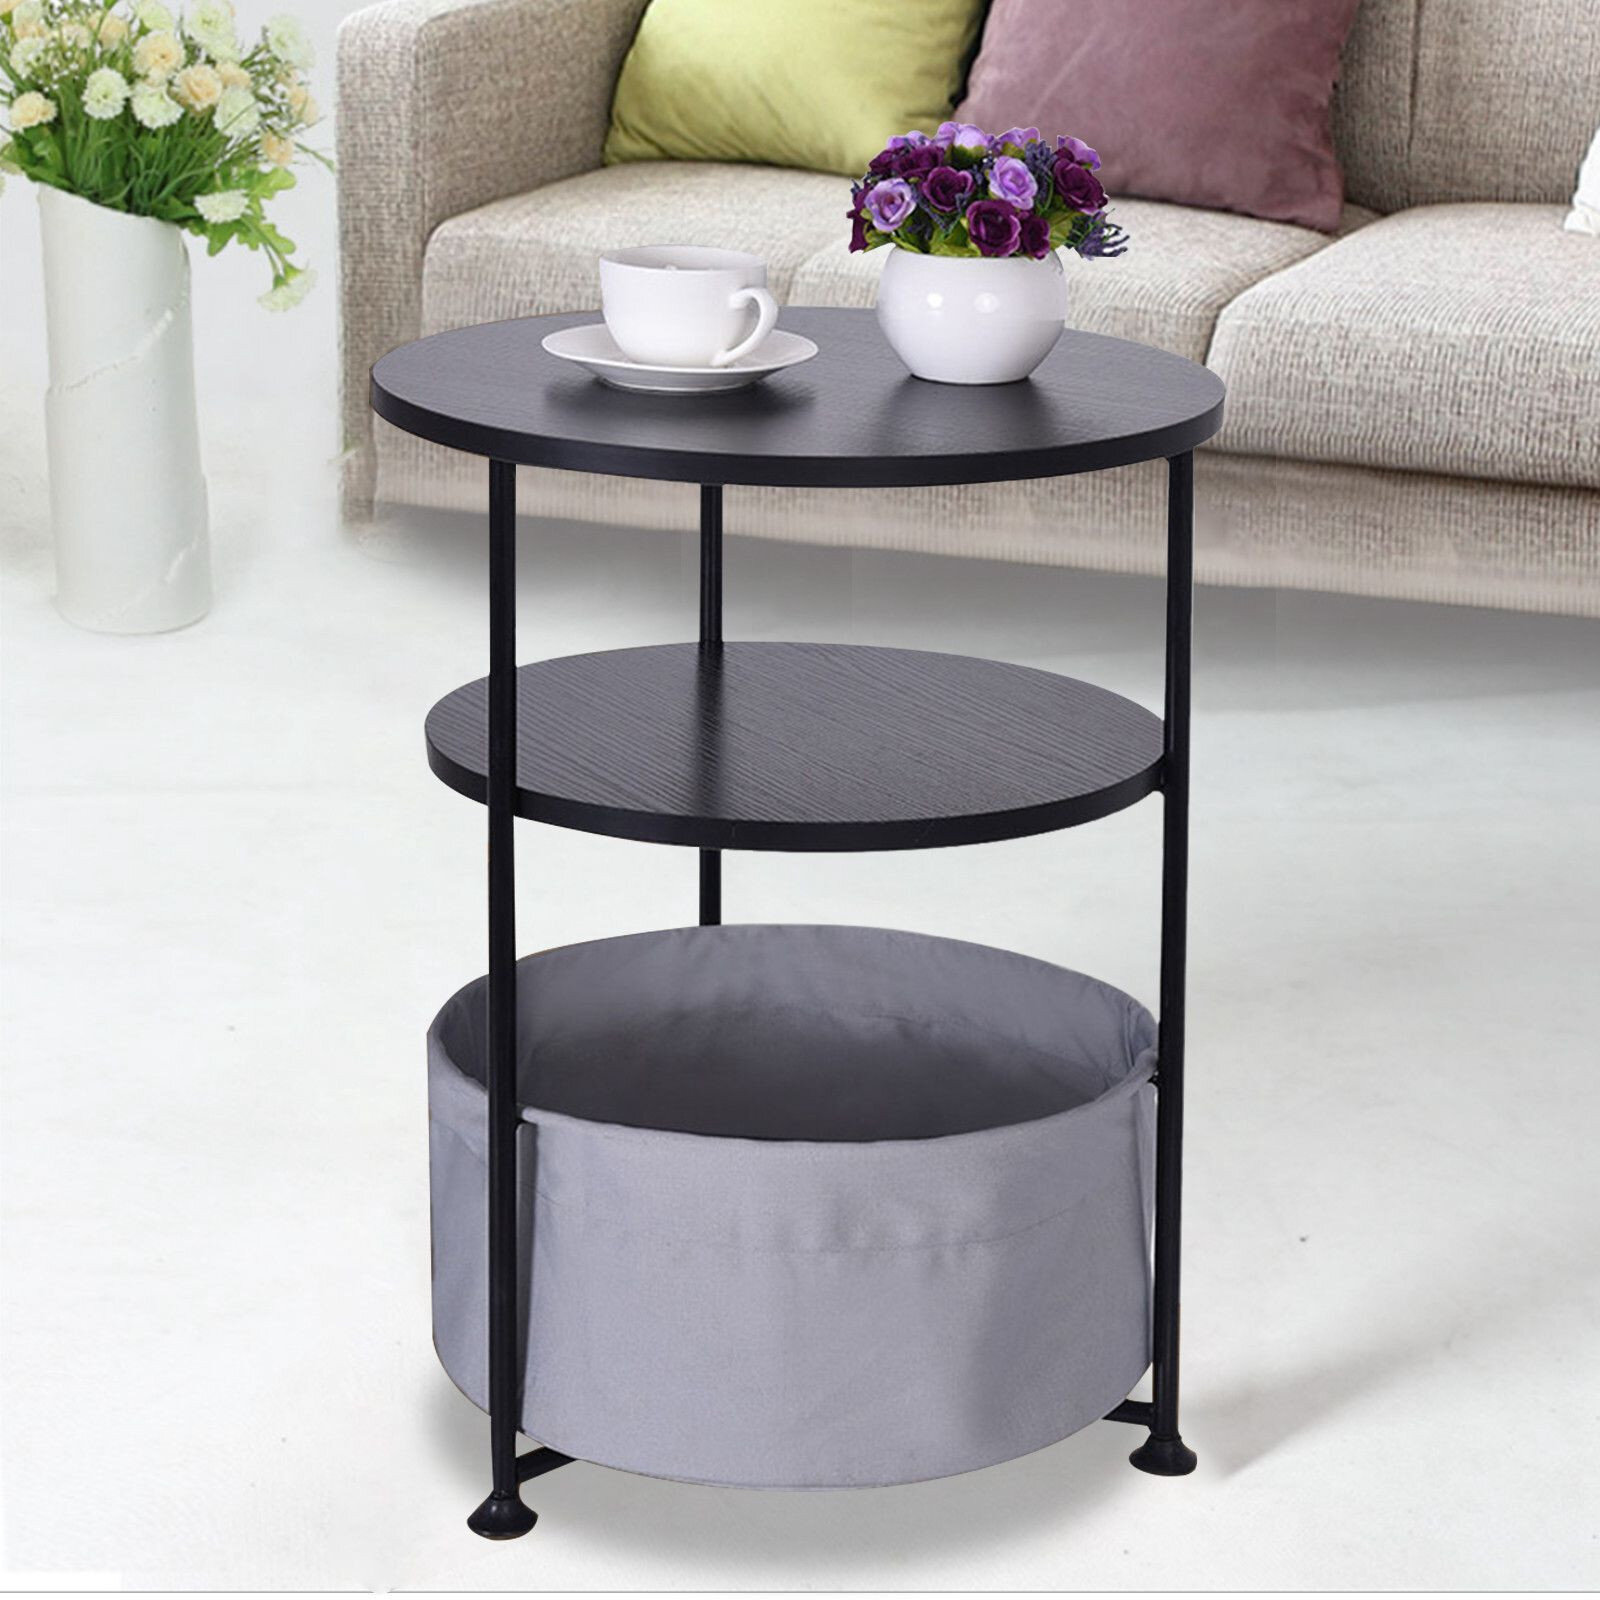 3 Legs Latitude Run End Side Tables You Ll Love In 2021 Wayfair